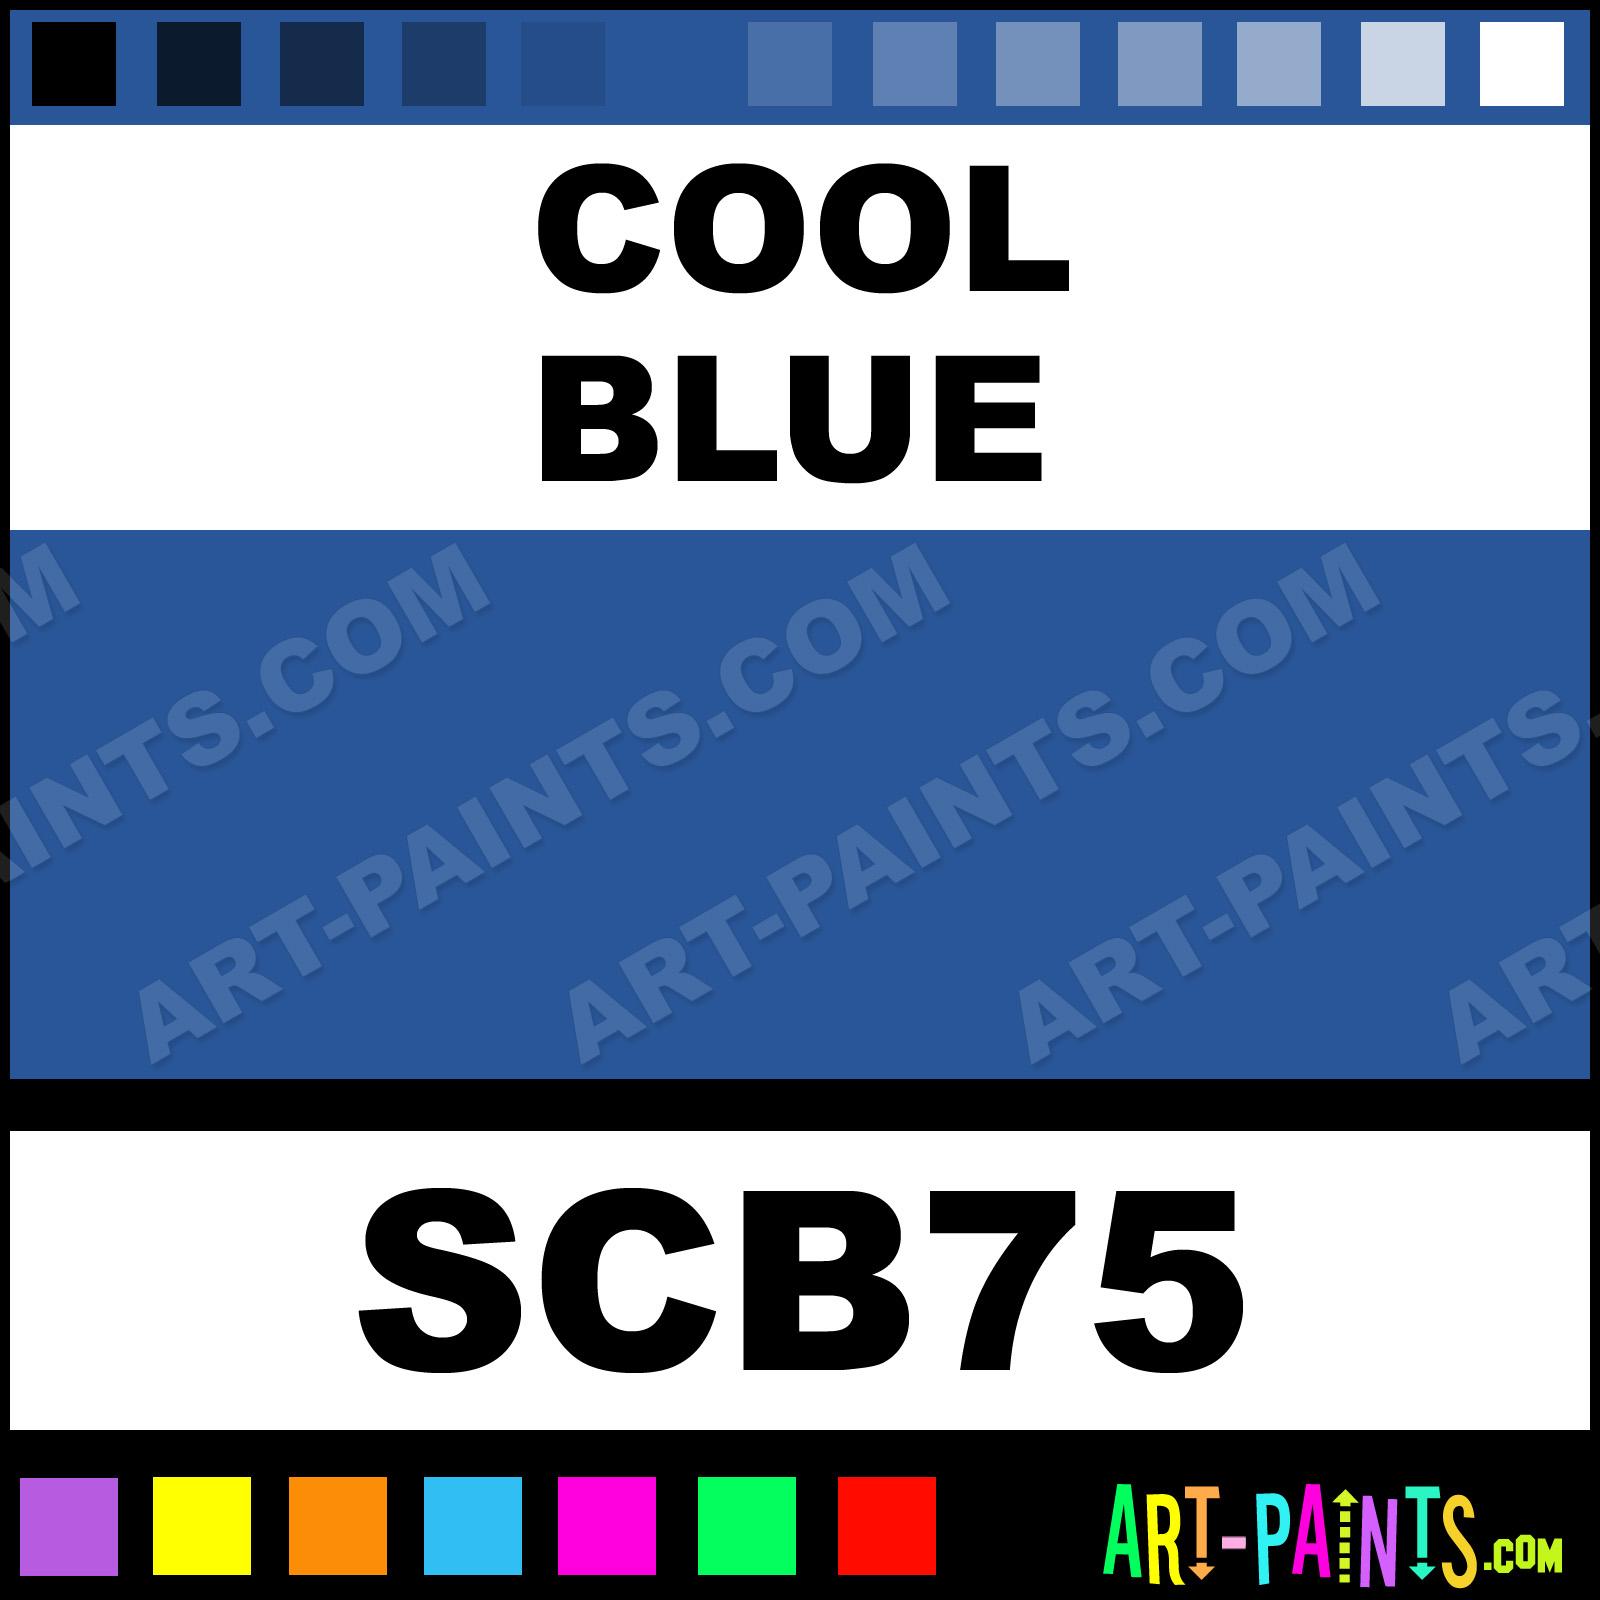 Cool Blue Student Acrylic Paints